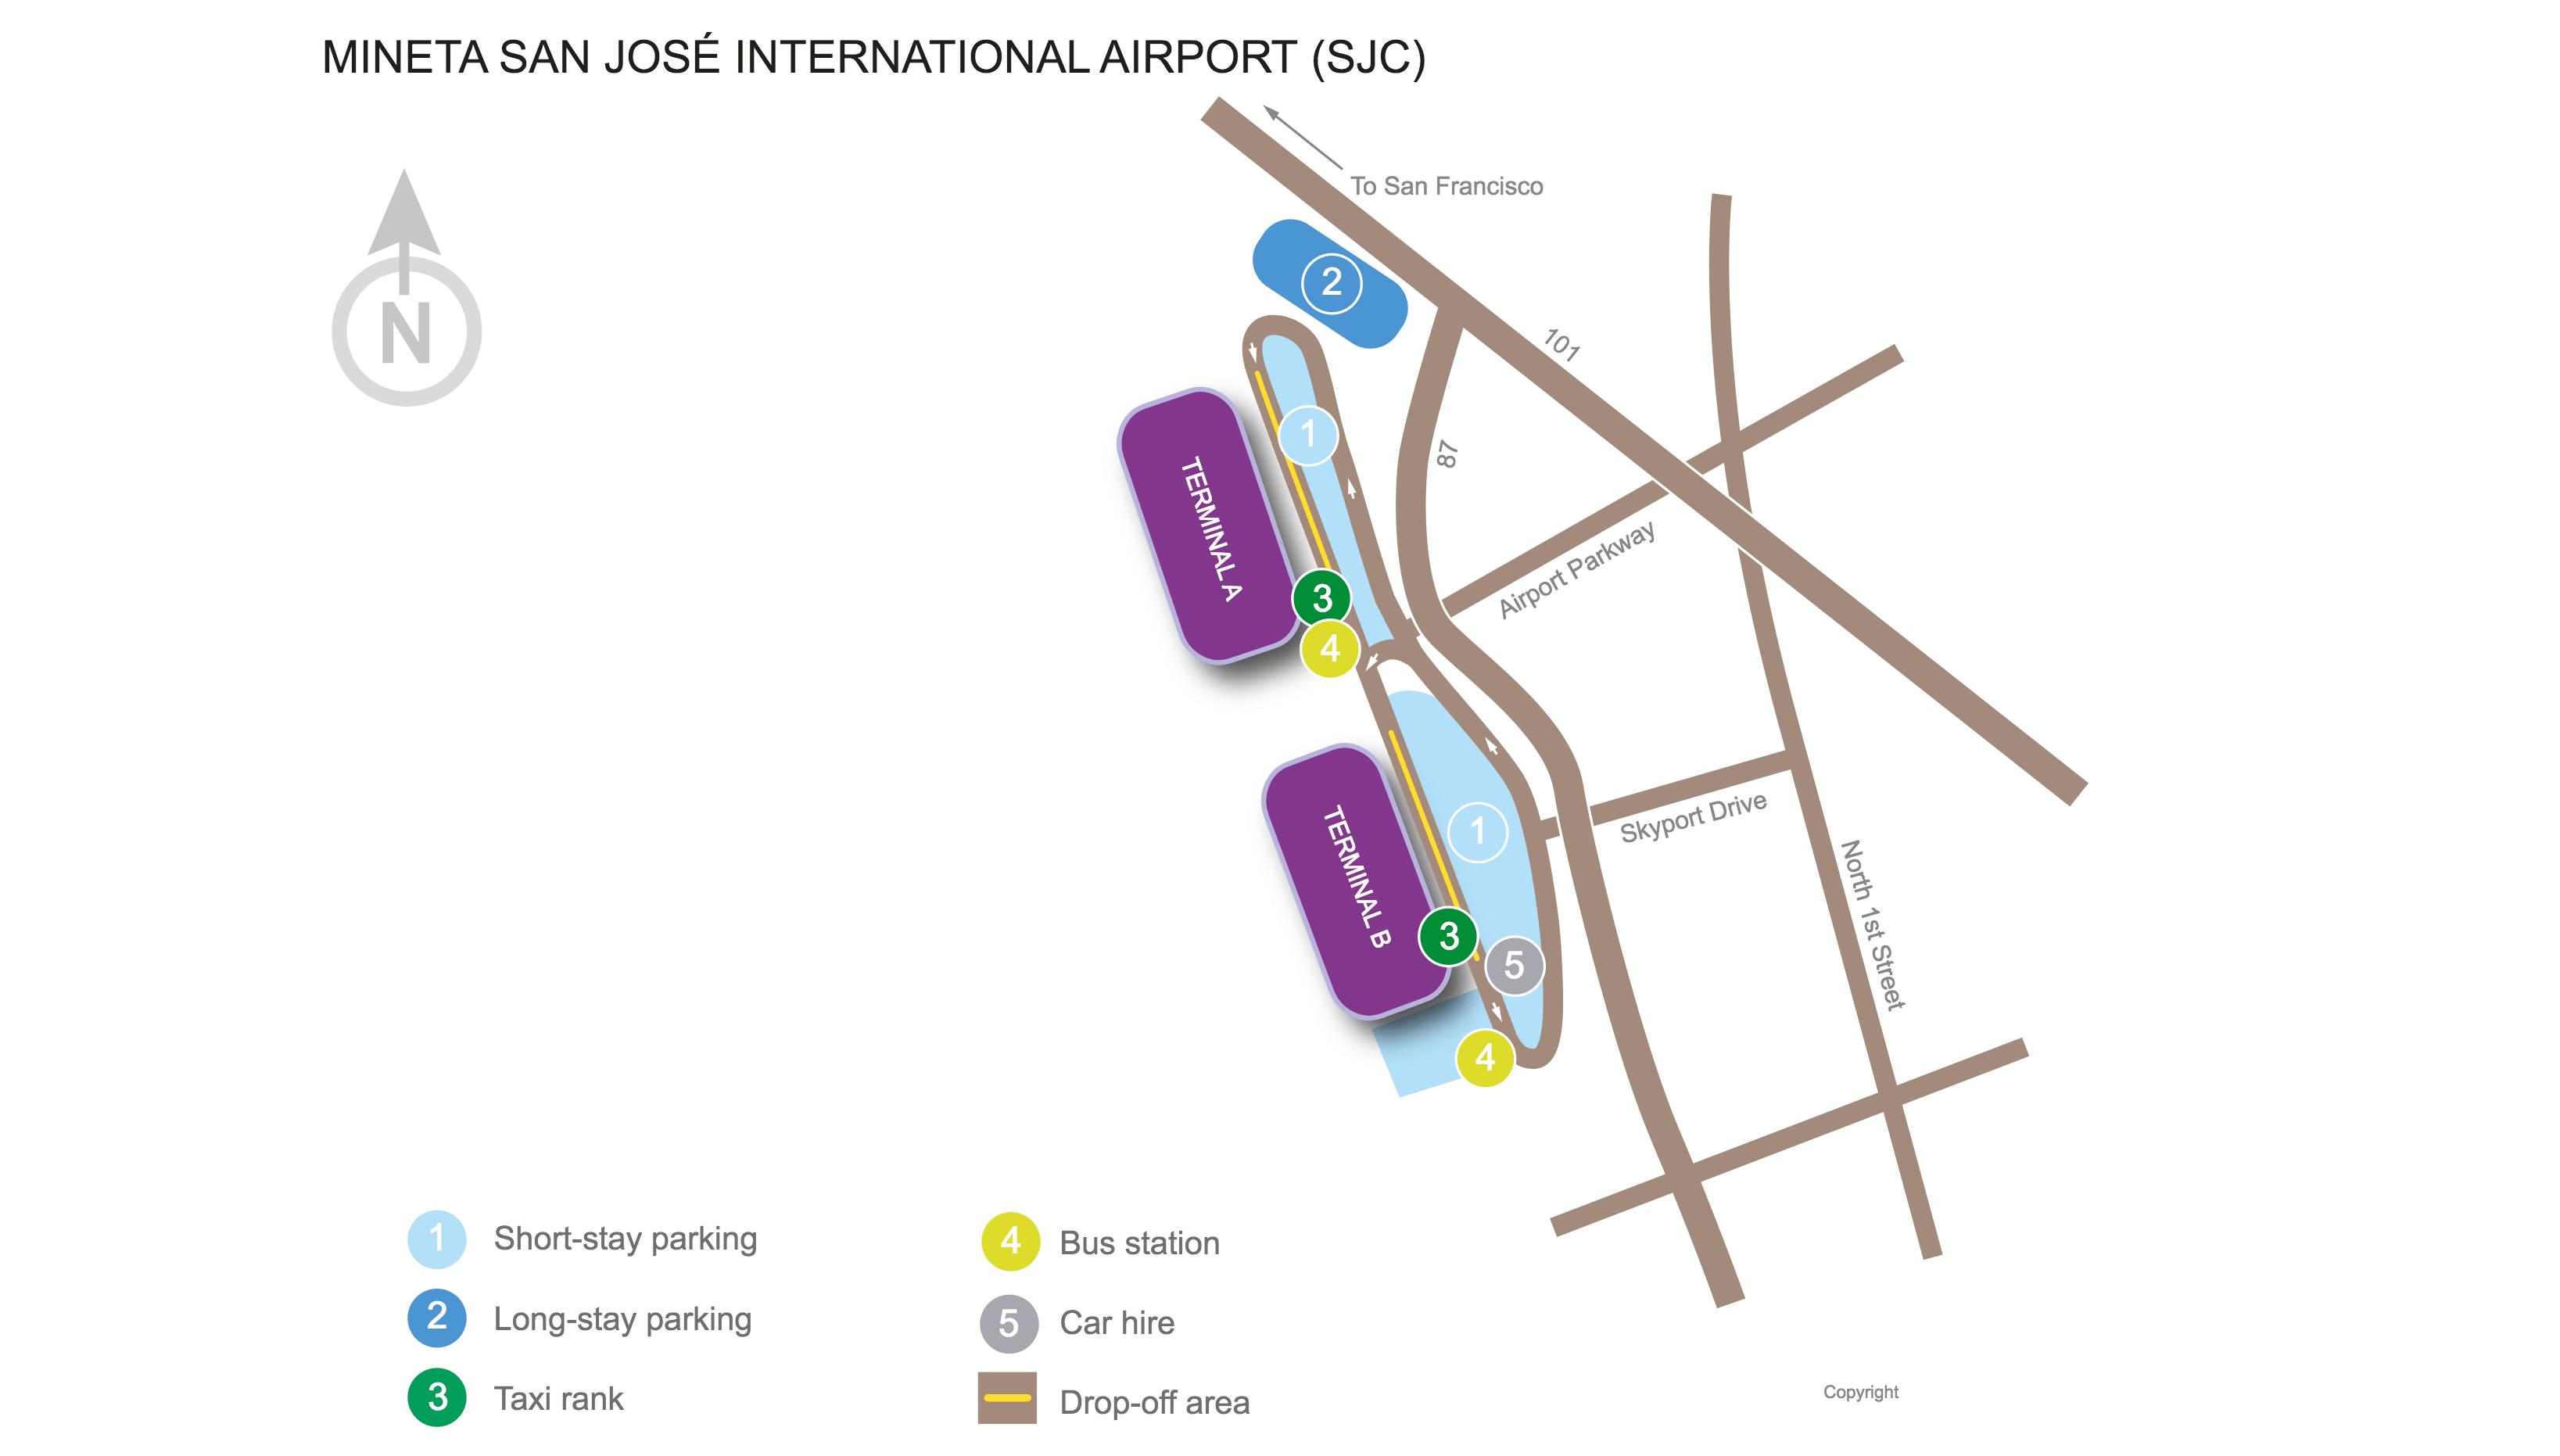 Norman Y. Mineta San Jose International Airport map